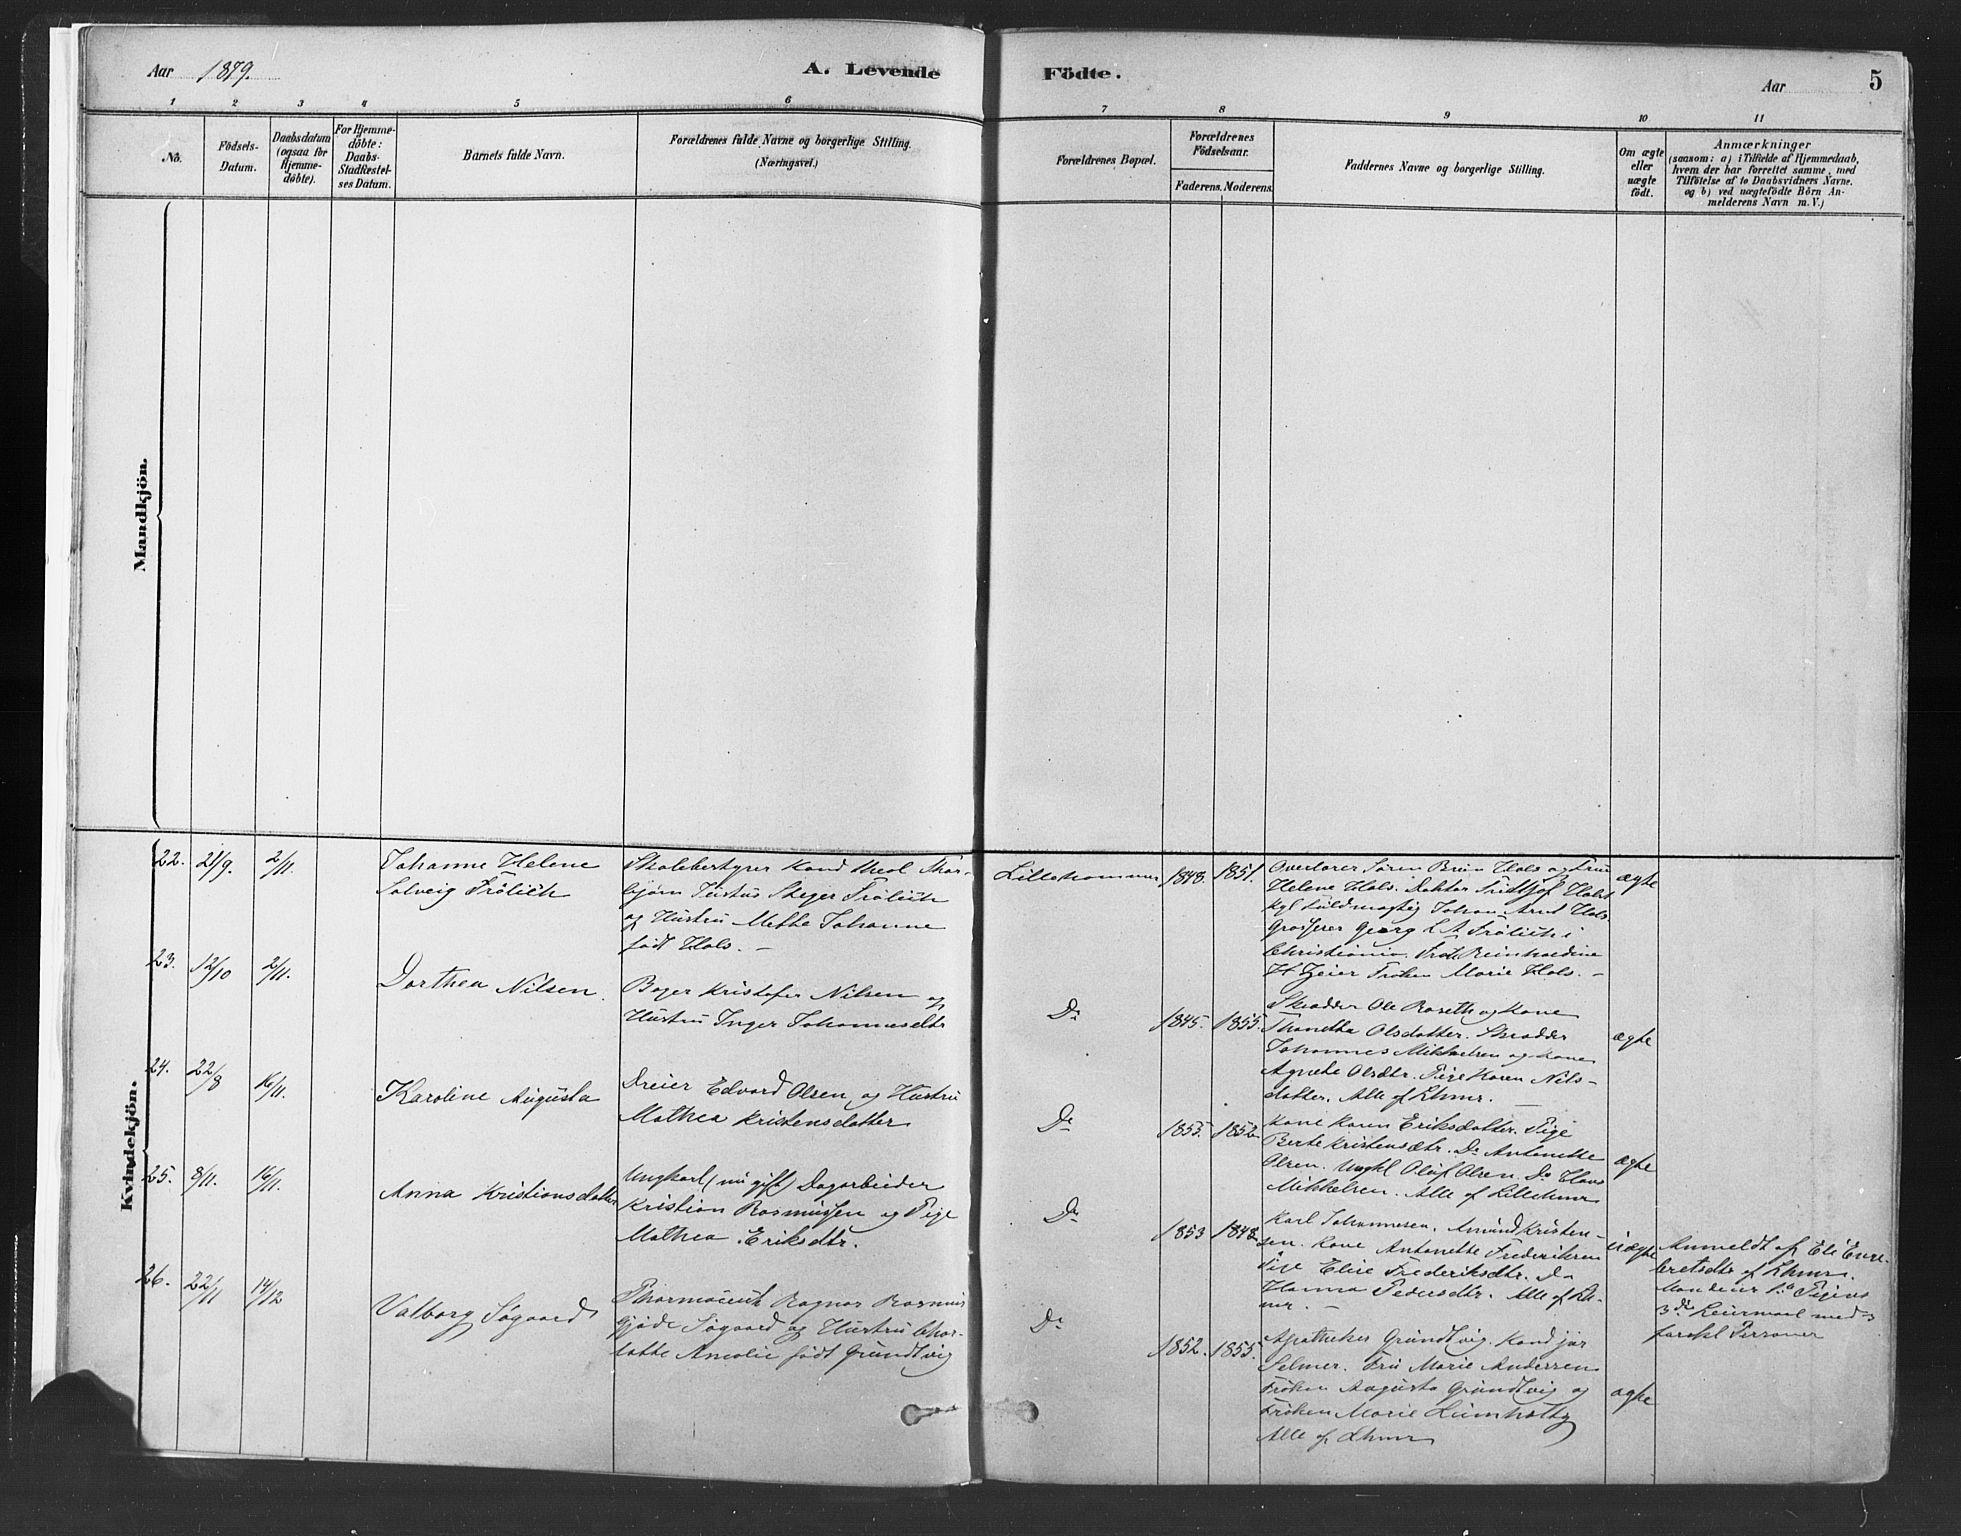 SAH, Fåberg prestekontor, H/Ha/Haa/L0010: Ministerialbok nr. 10, 1879-1900, s. 5